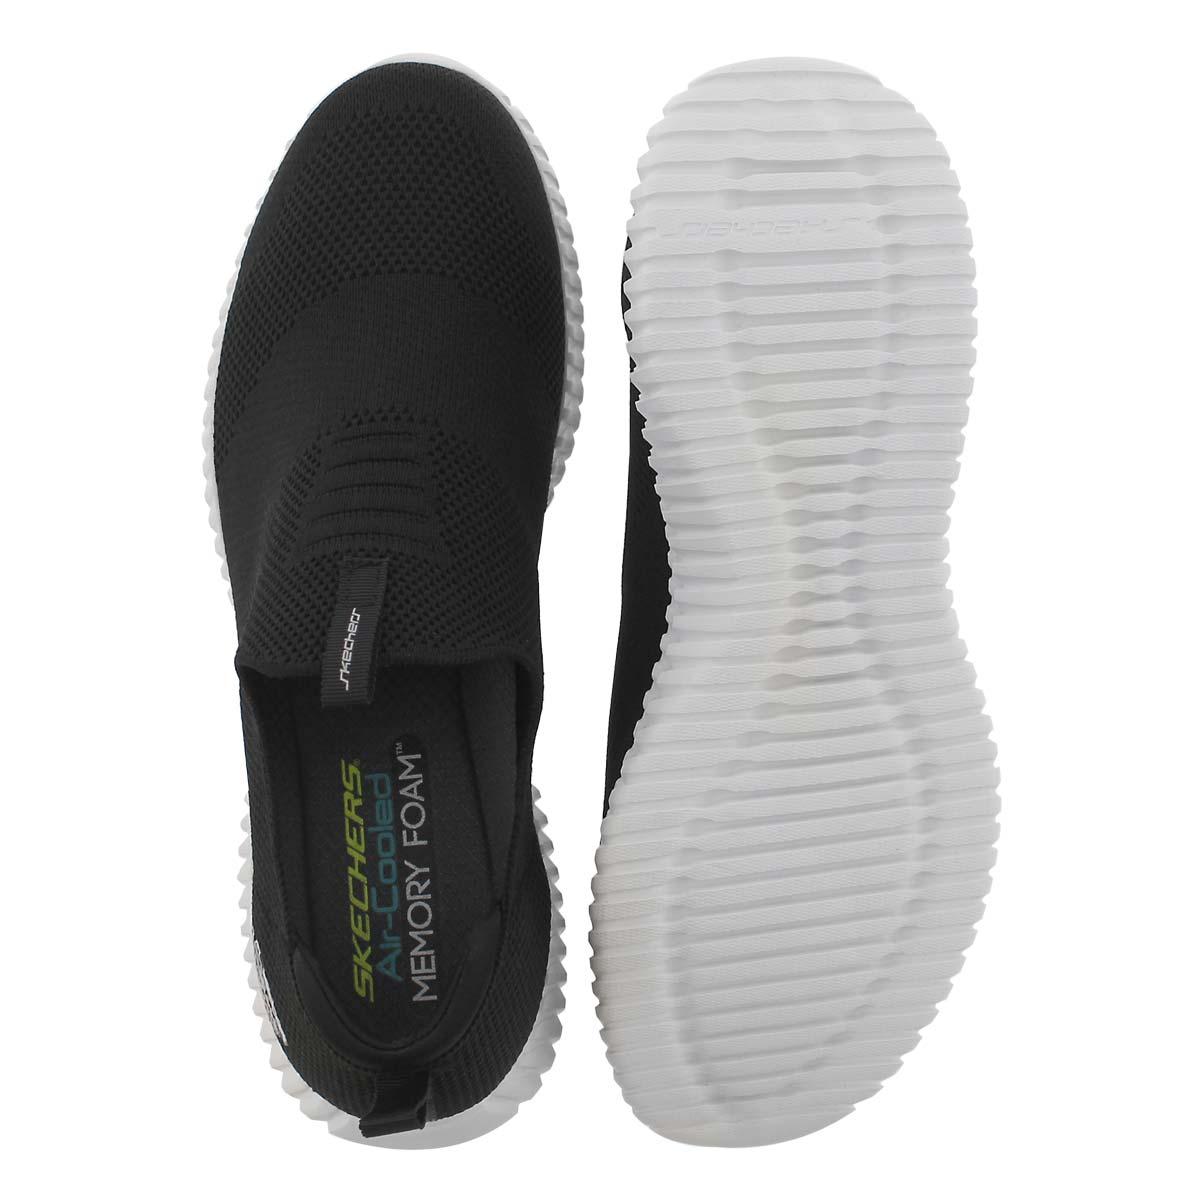 Mns Elite Flex Wasik blk/wt slip on shoe